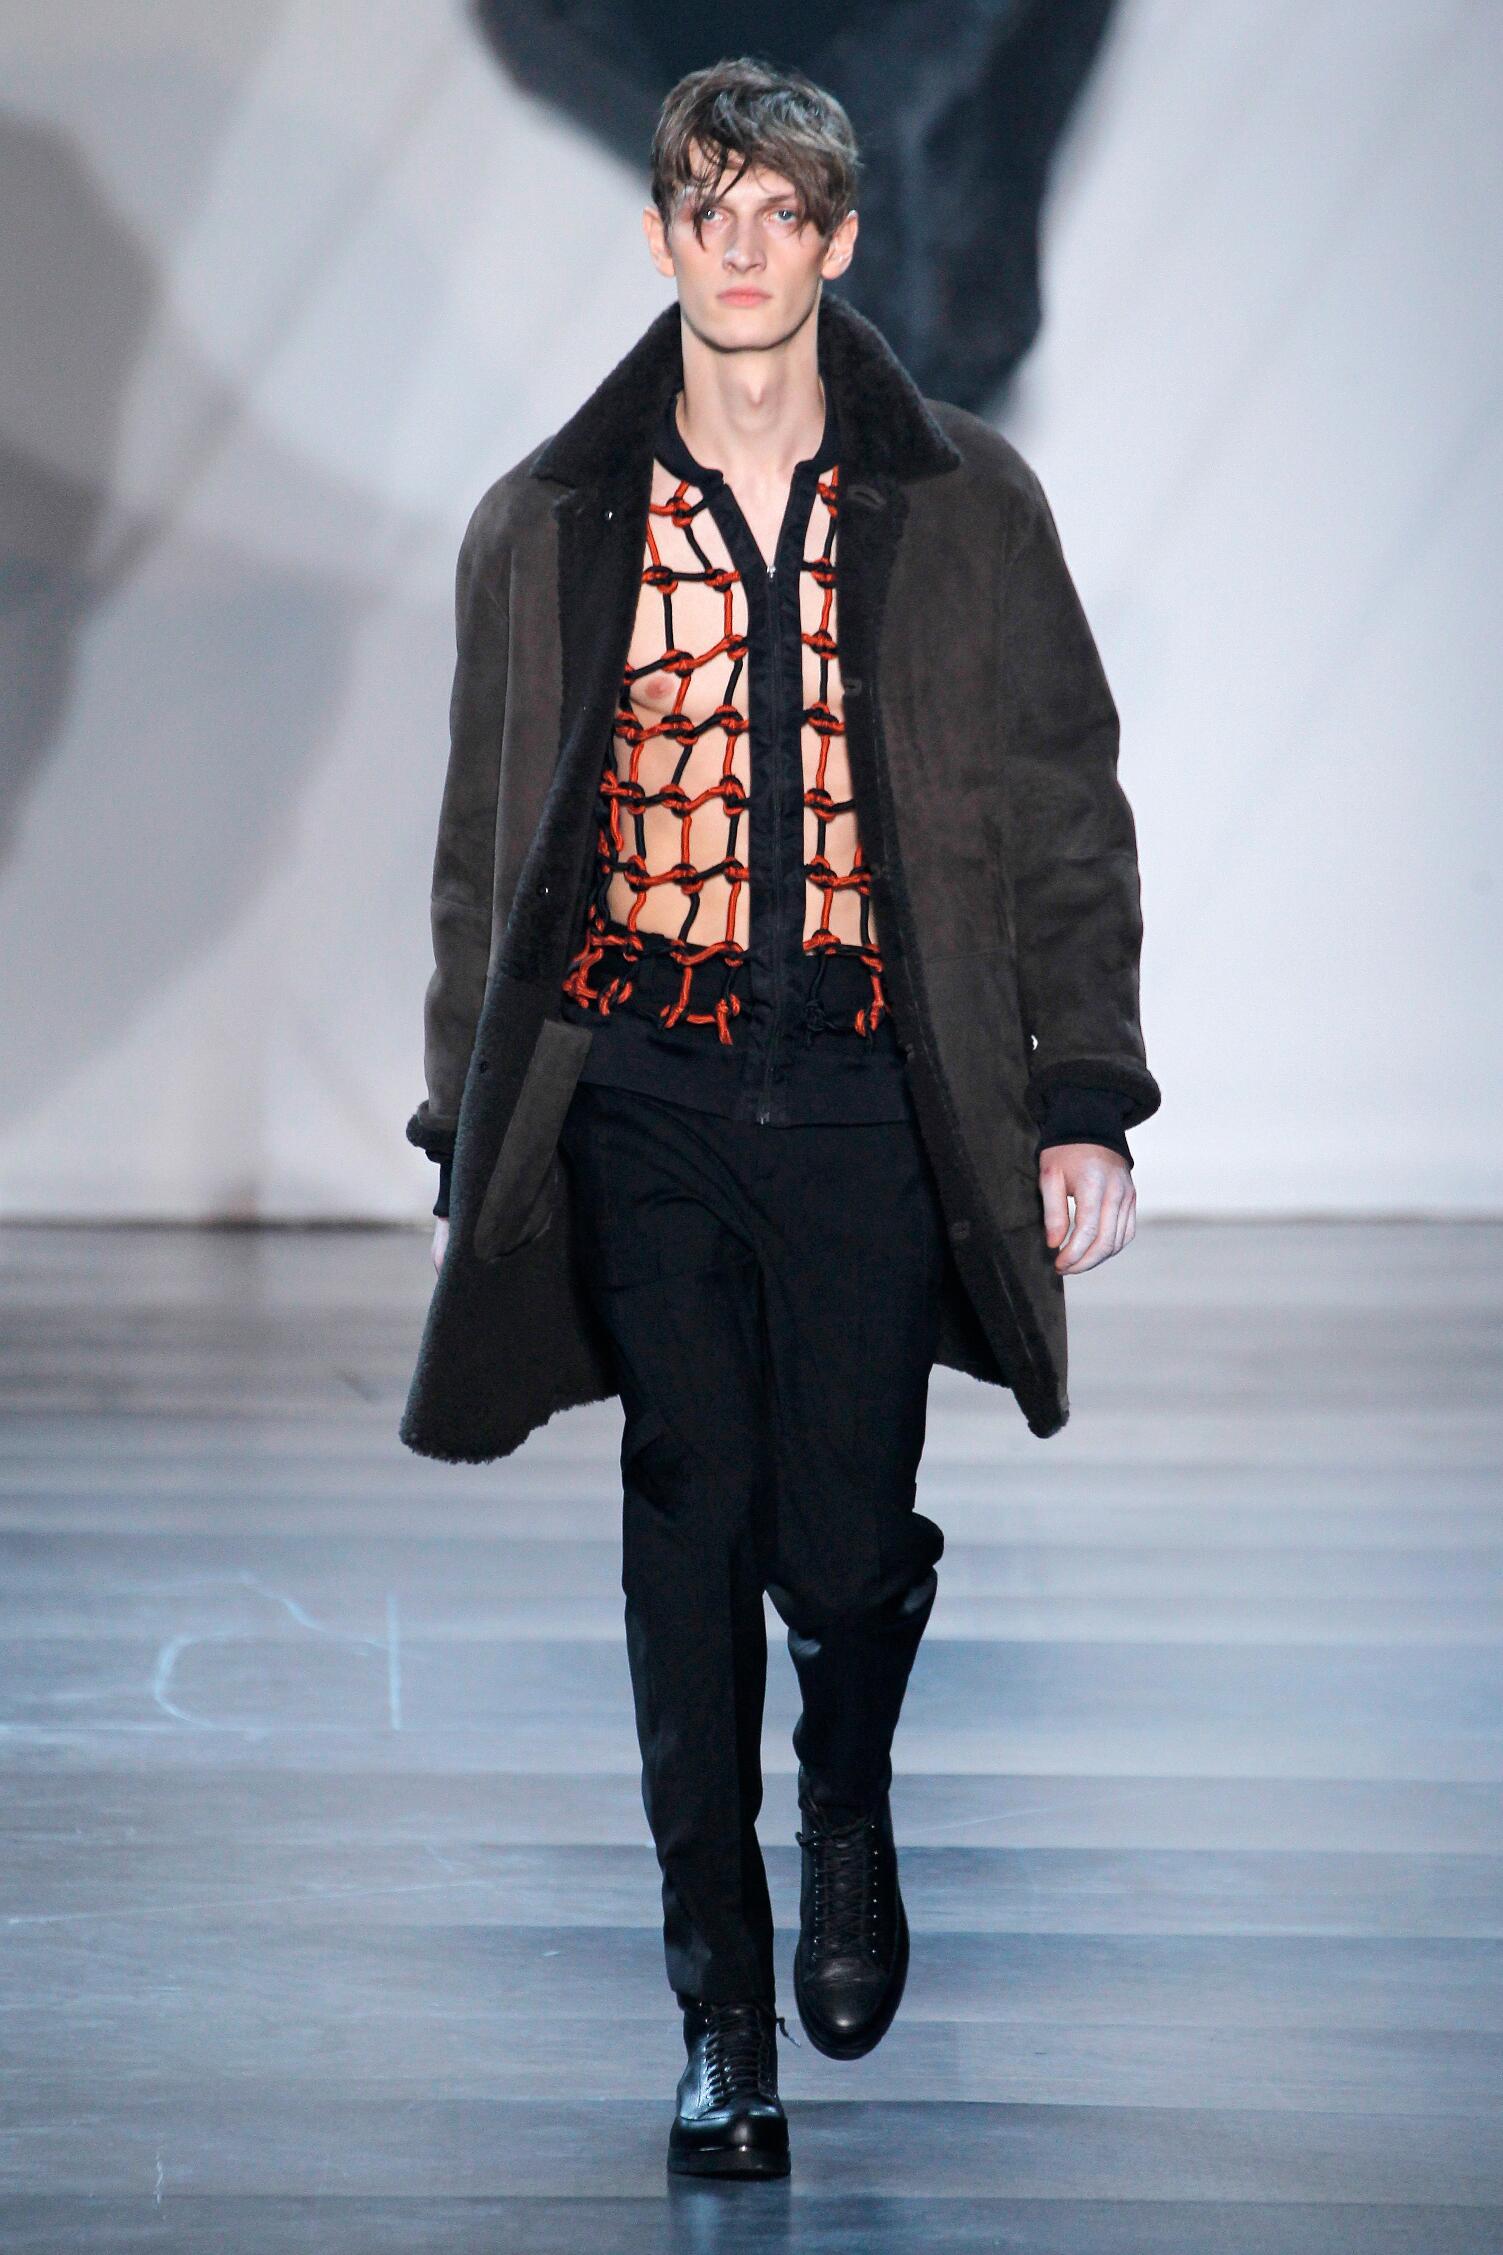 Catwalk 3.1 Phillip Lim Fall Winter 2015 16 Men's Collection Paris Fashion Week